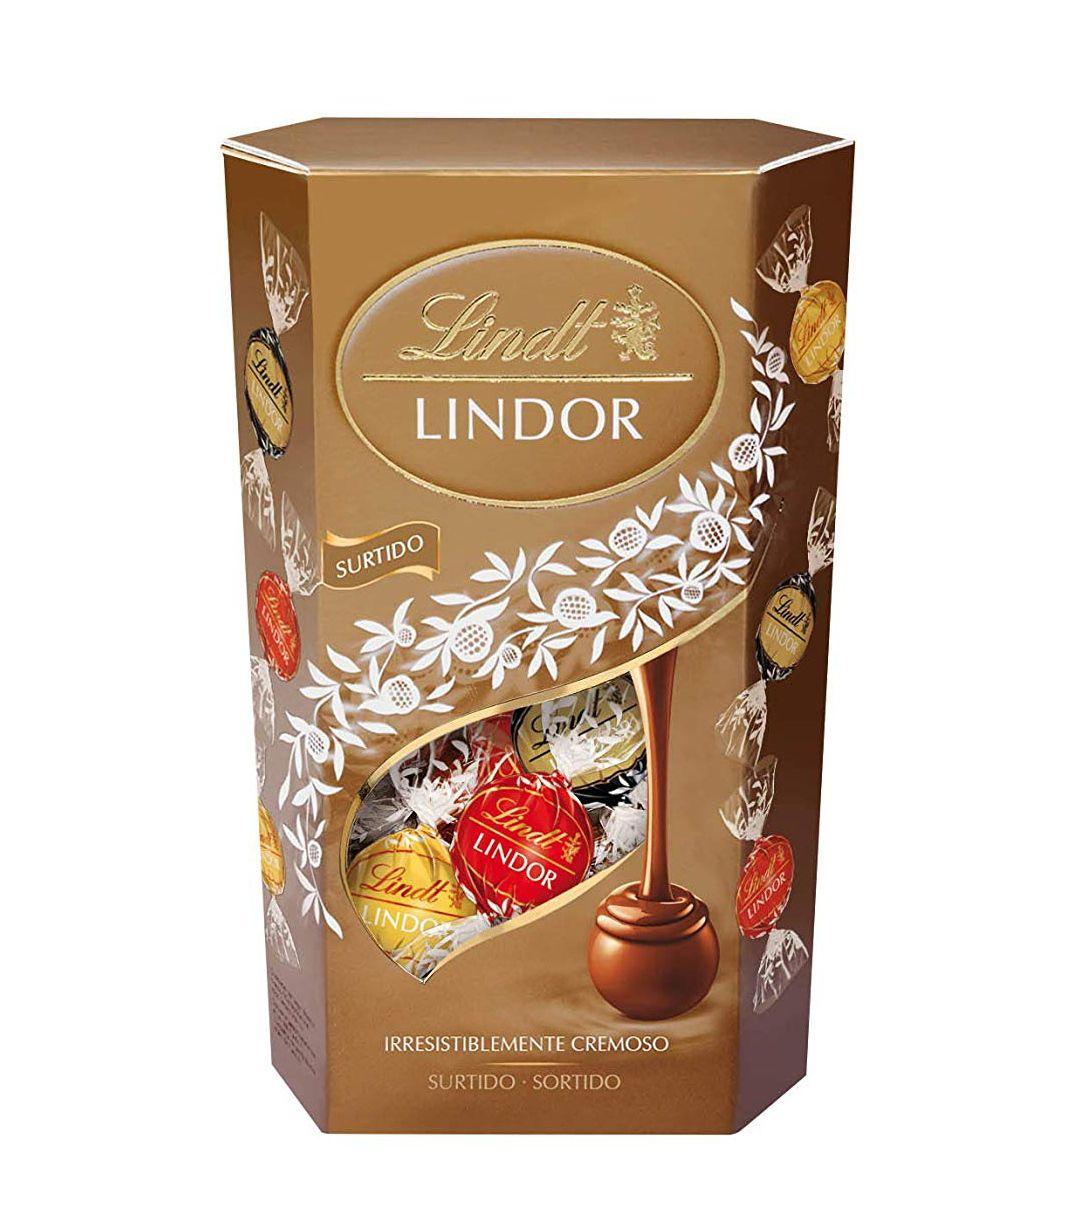 Bombones 3 chocolates Lindt caja 600g